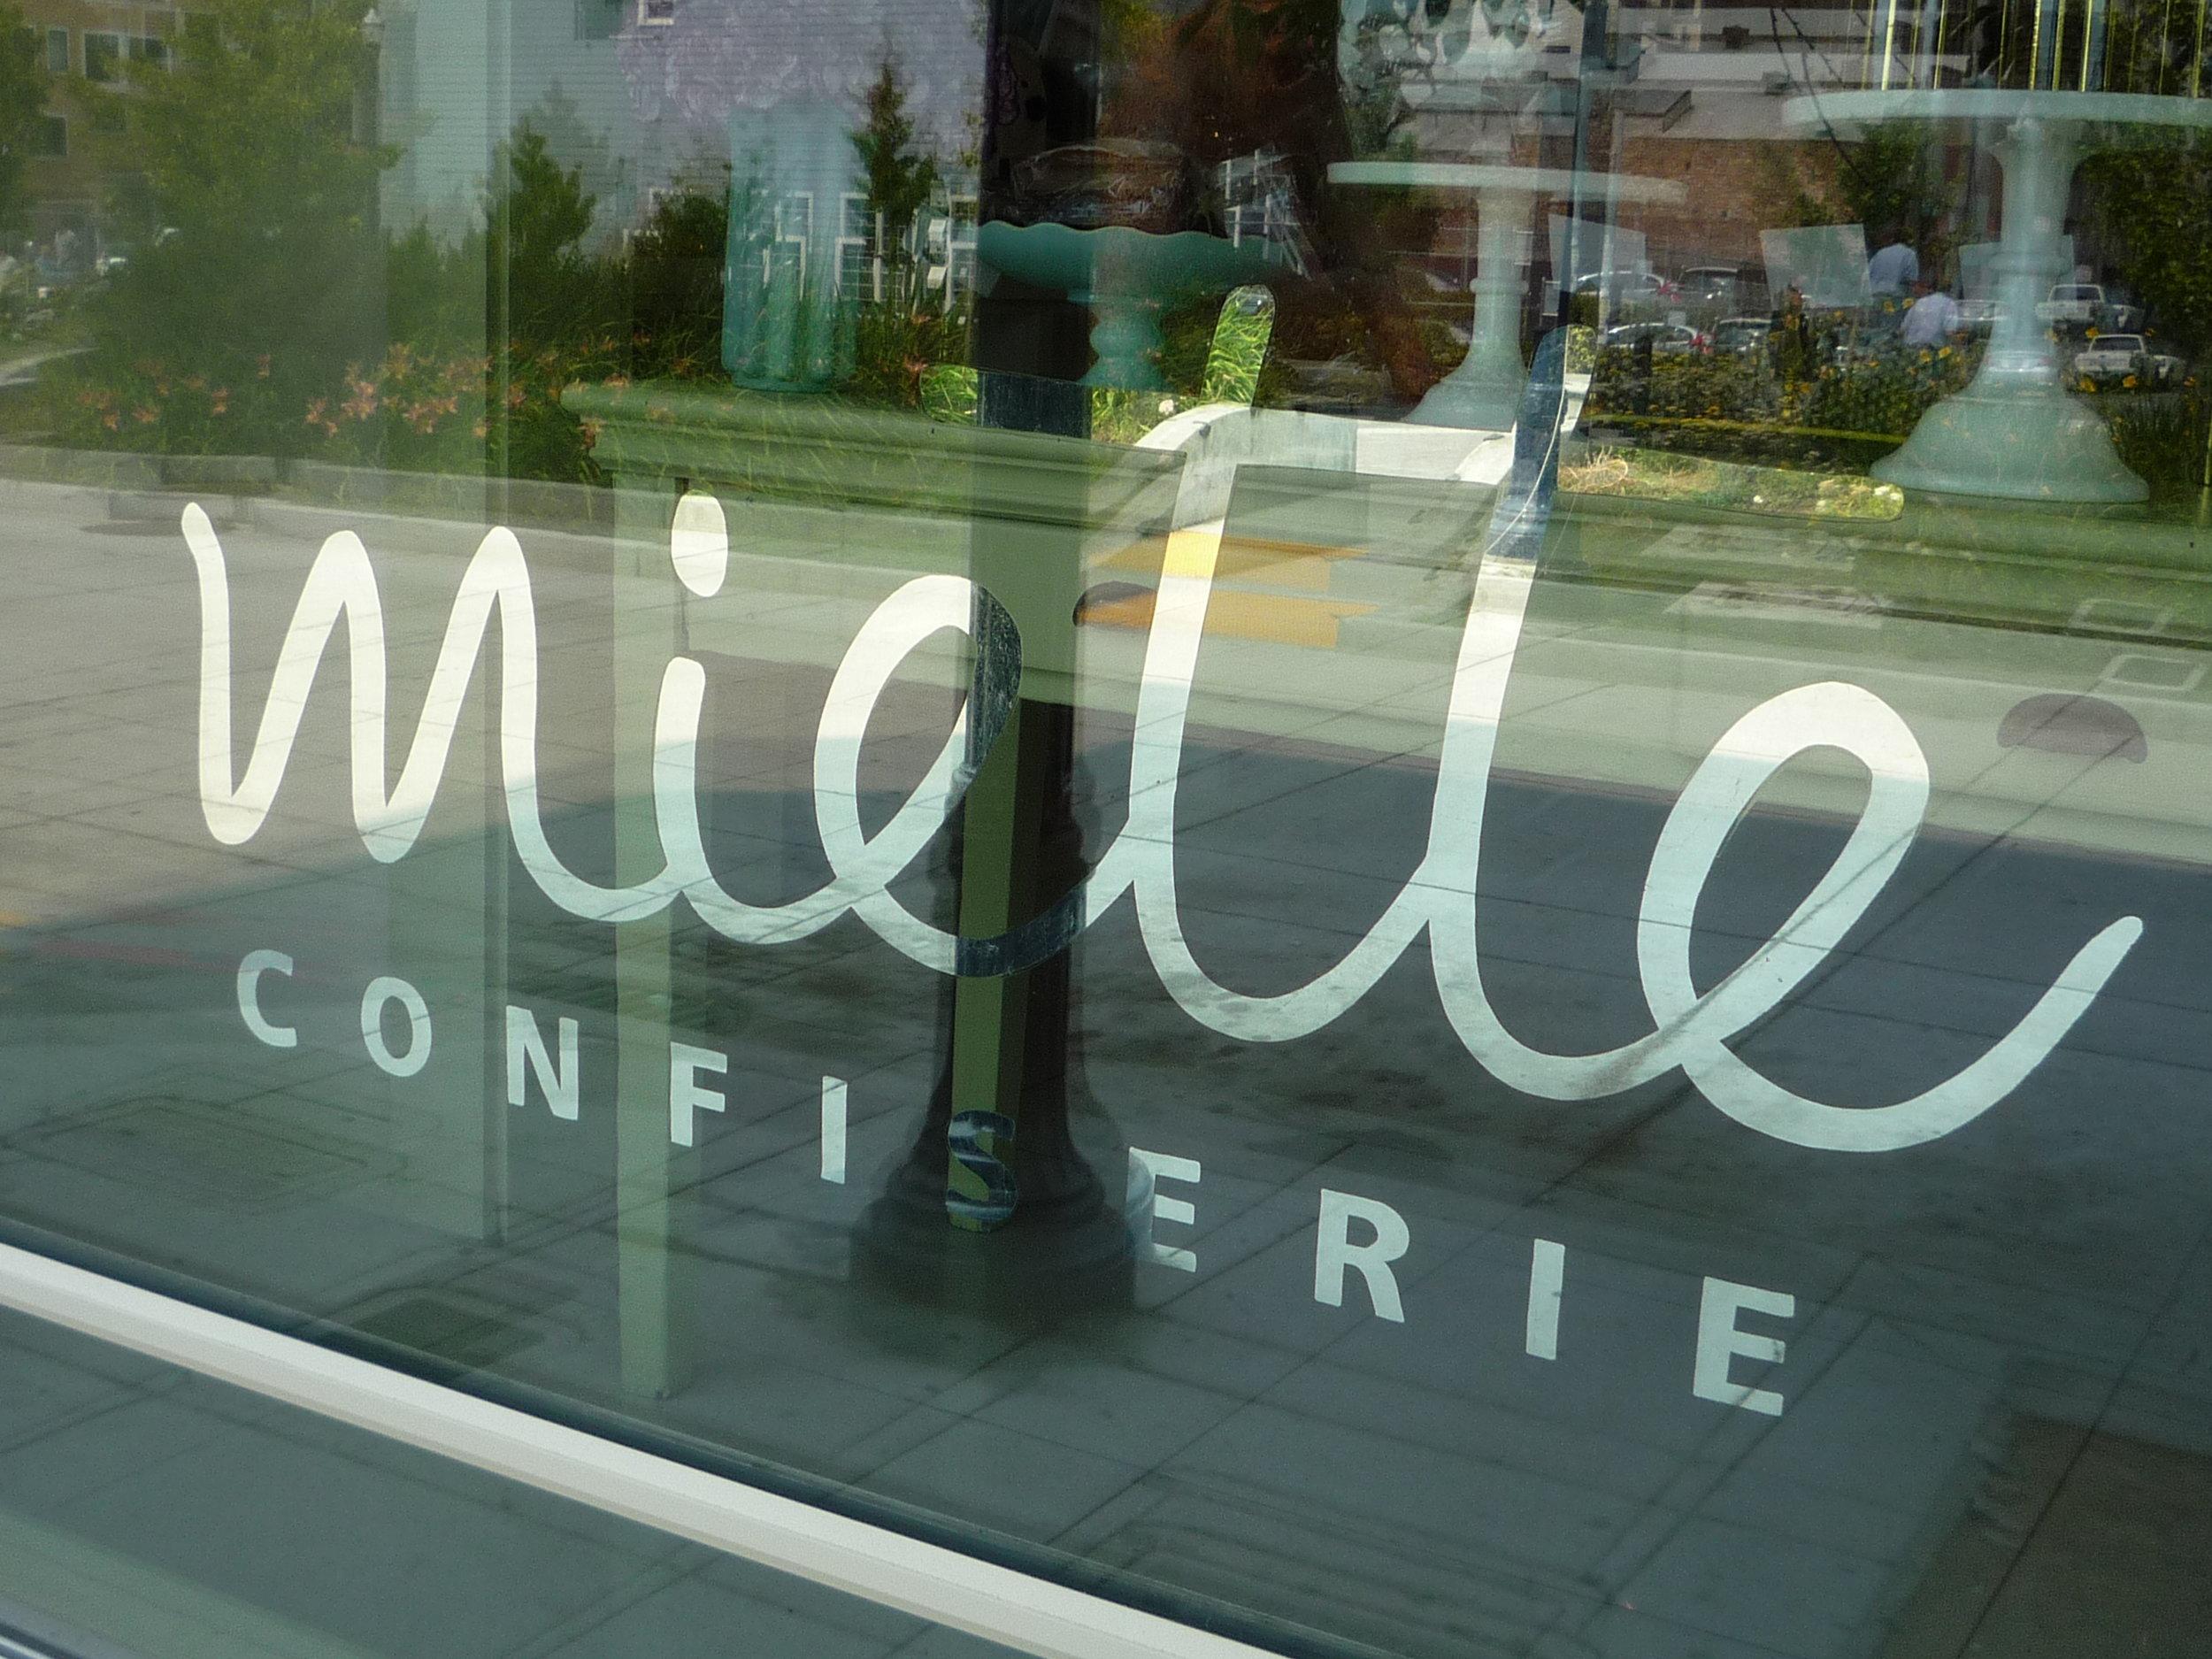 GOLD-miette-confiserie-window_3060355392_o.jpg